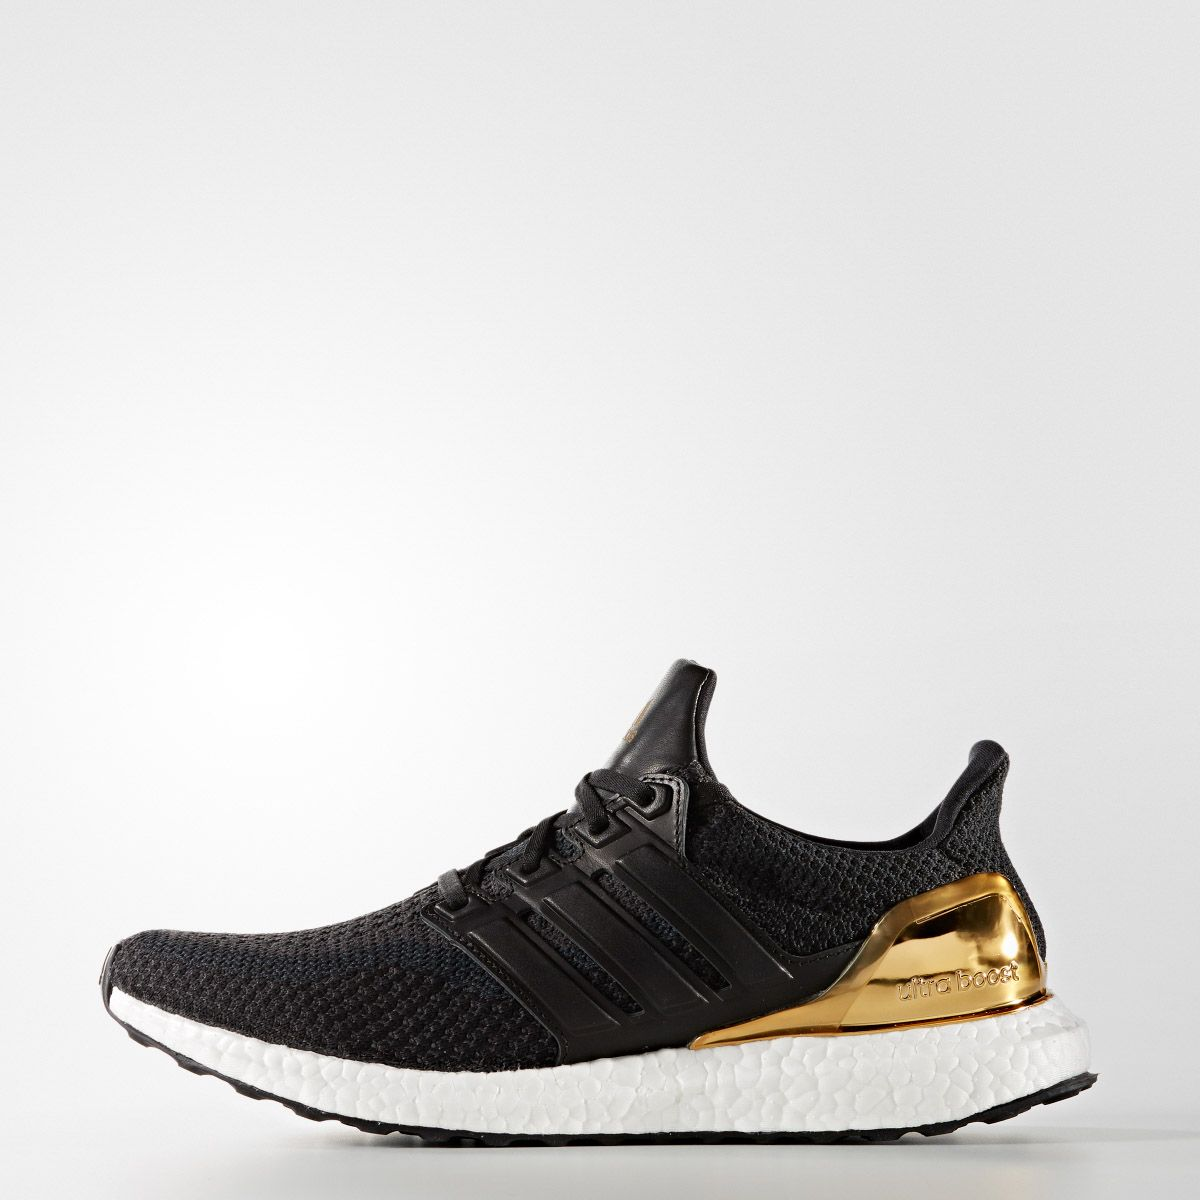 adidas Ultra Boost – Metallic Pack, #adidas #adidasboost #MetallicPack #sneaker #UltraBOOST #YeezyBOOST, #agpos, #sneaker, #sneakers, #sneakerhead, #solecollector, #sneakerfreaker, #nicekicks, #kicks, #kotd, #kicks4eva #kicks0l0gy, #kicksonfire, #womft, #walklikeus, #schuhe, #turnschuhe, #yeezy, #nike, #adidas, #puma, #asics, #newbalance #jordan, #airjordan, #kicks